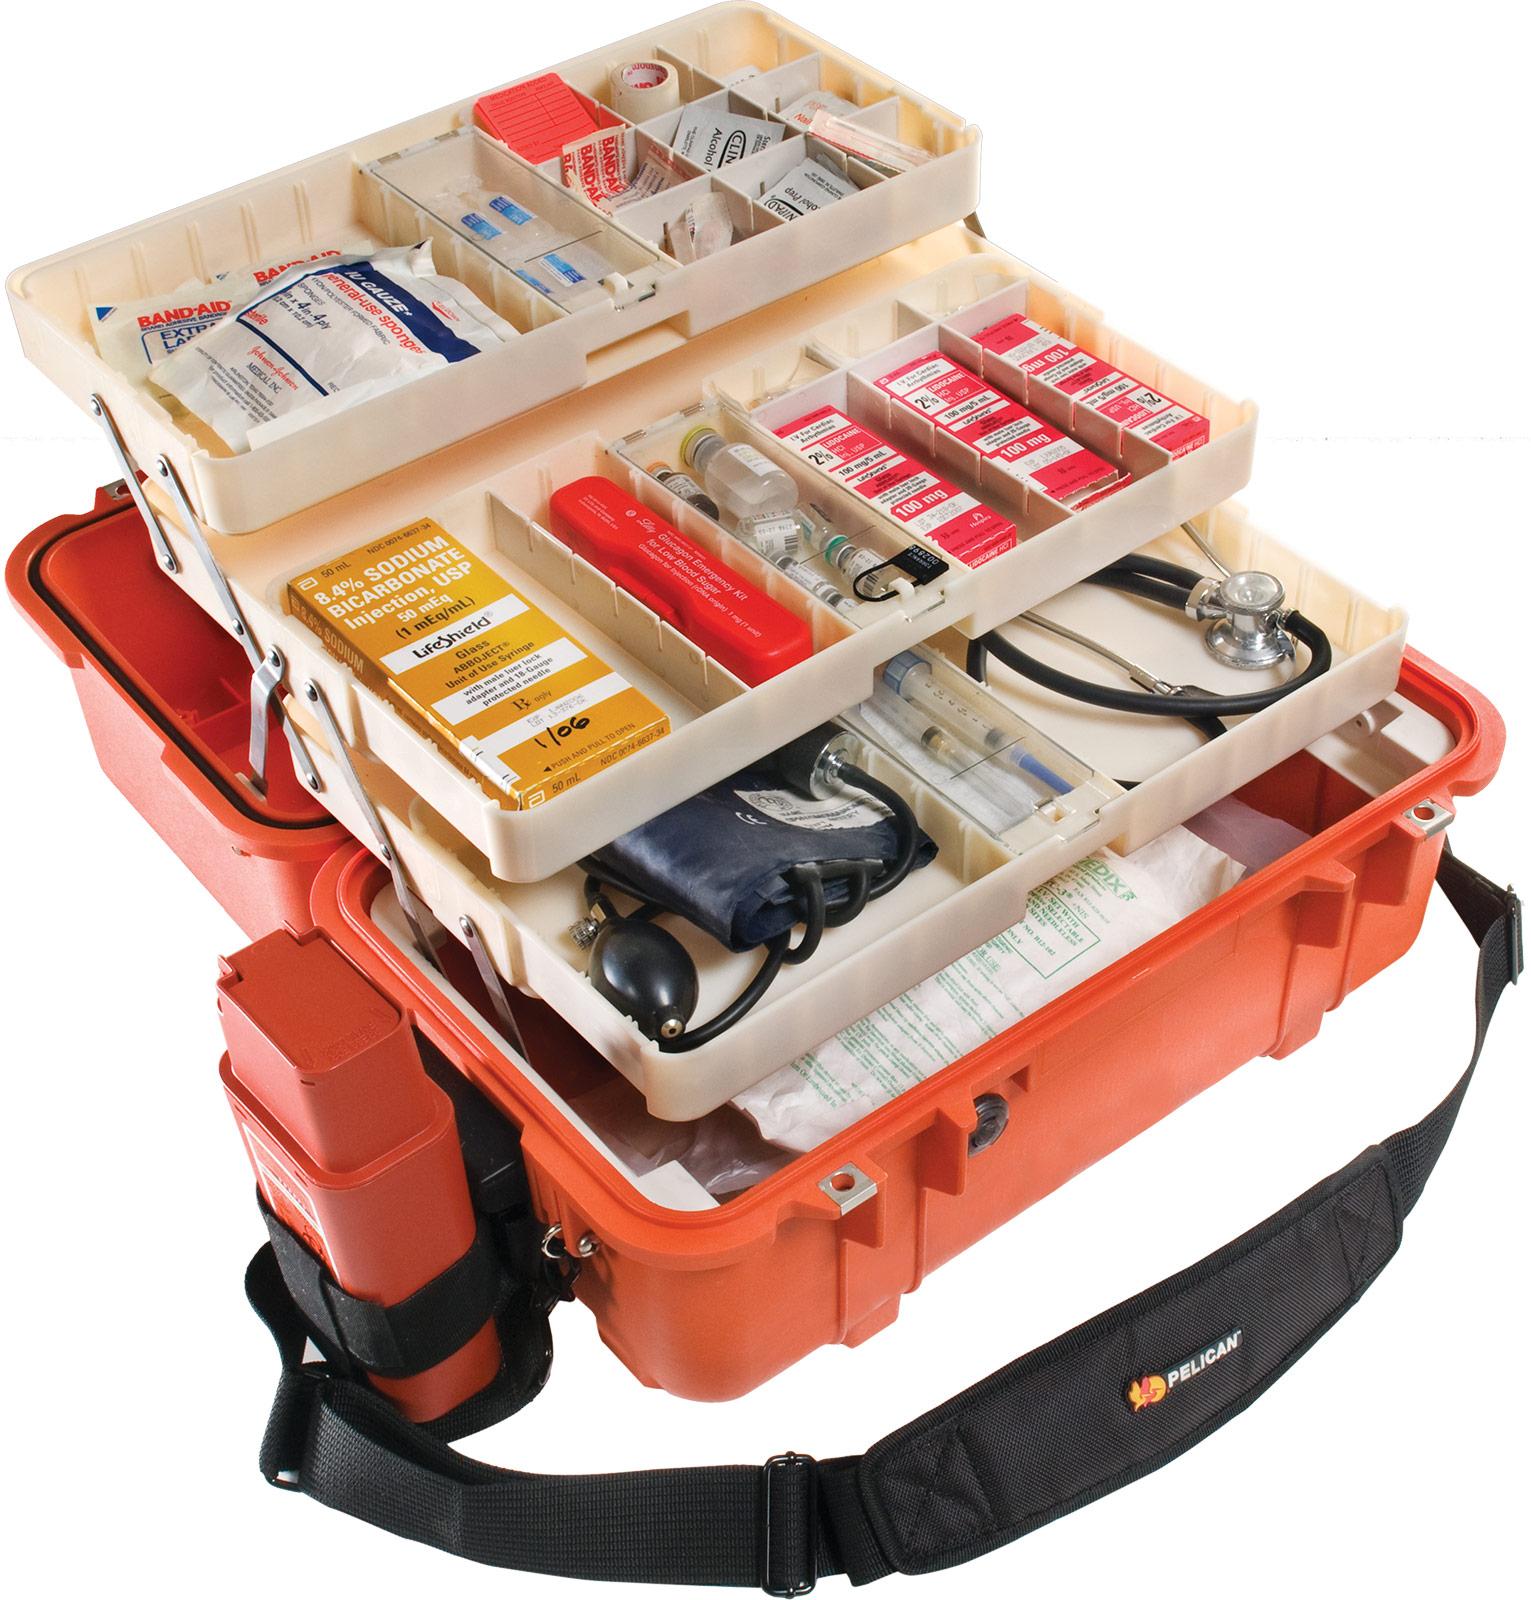 1460EMS Protector EMS Case | Pelican